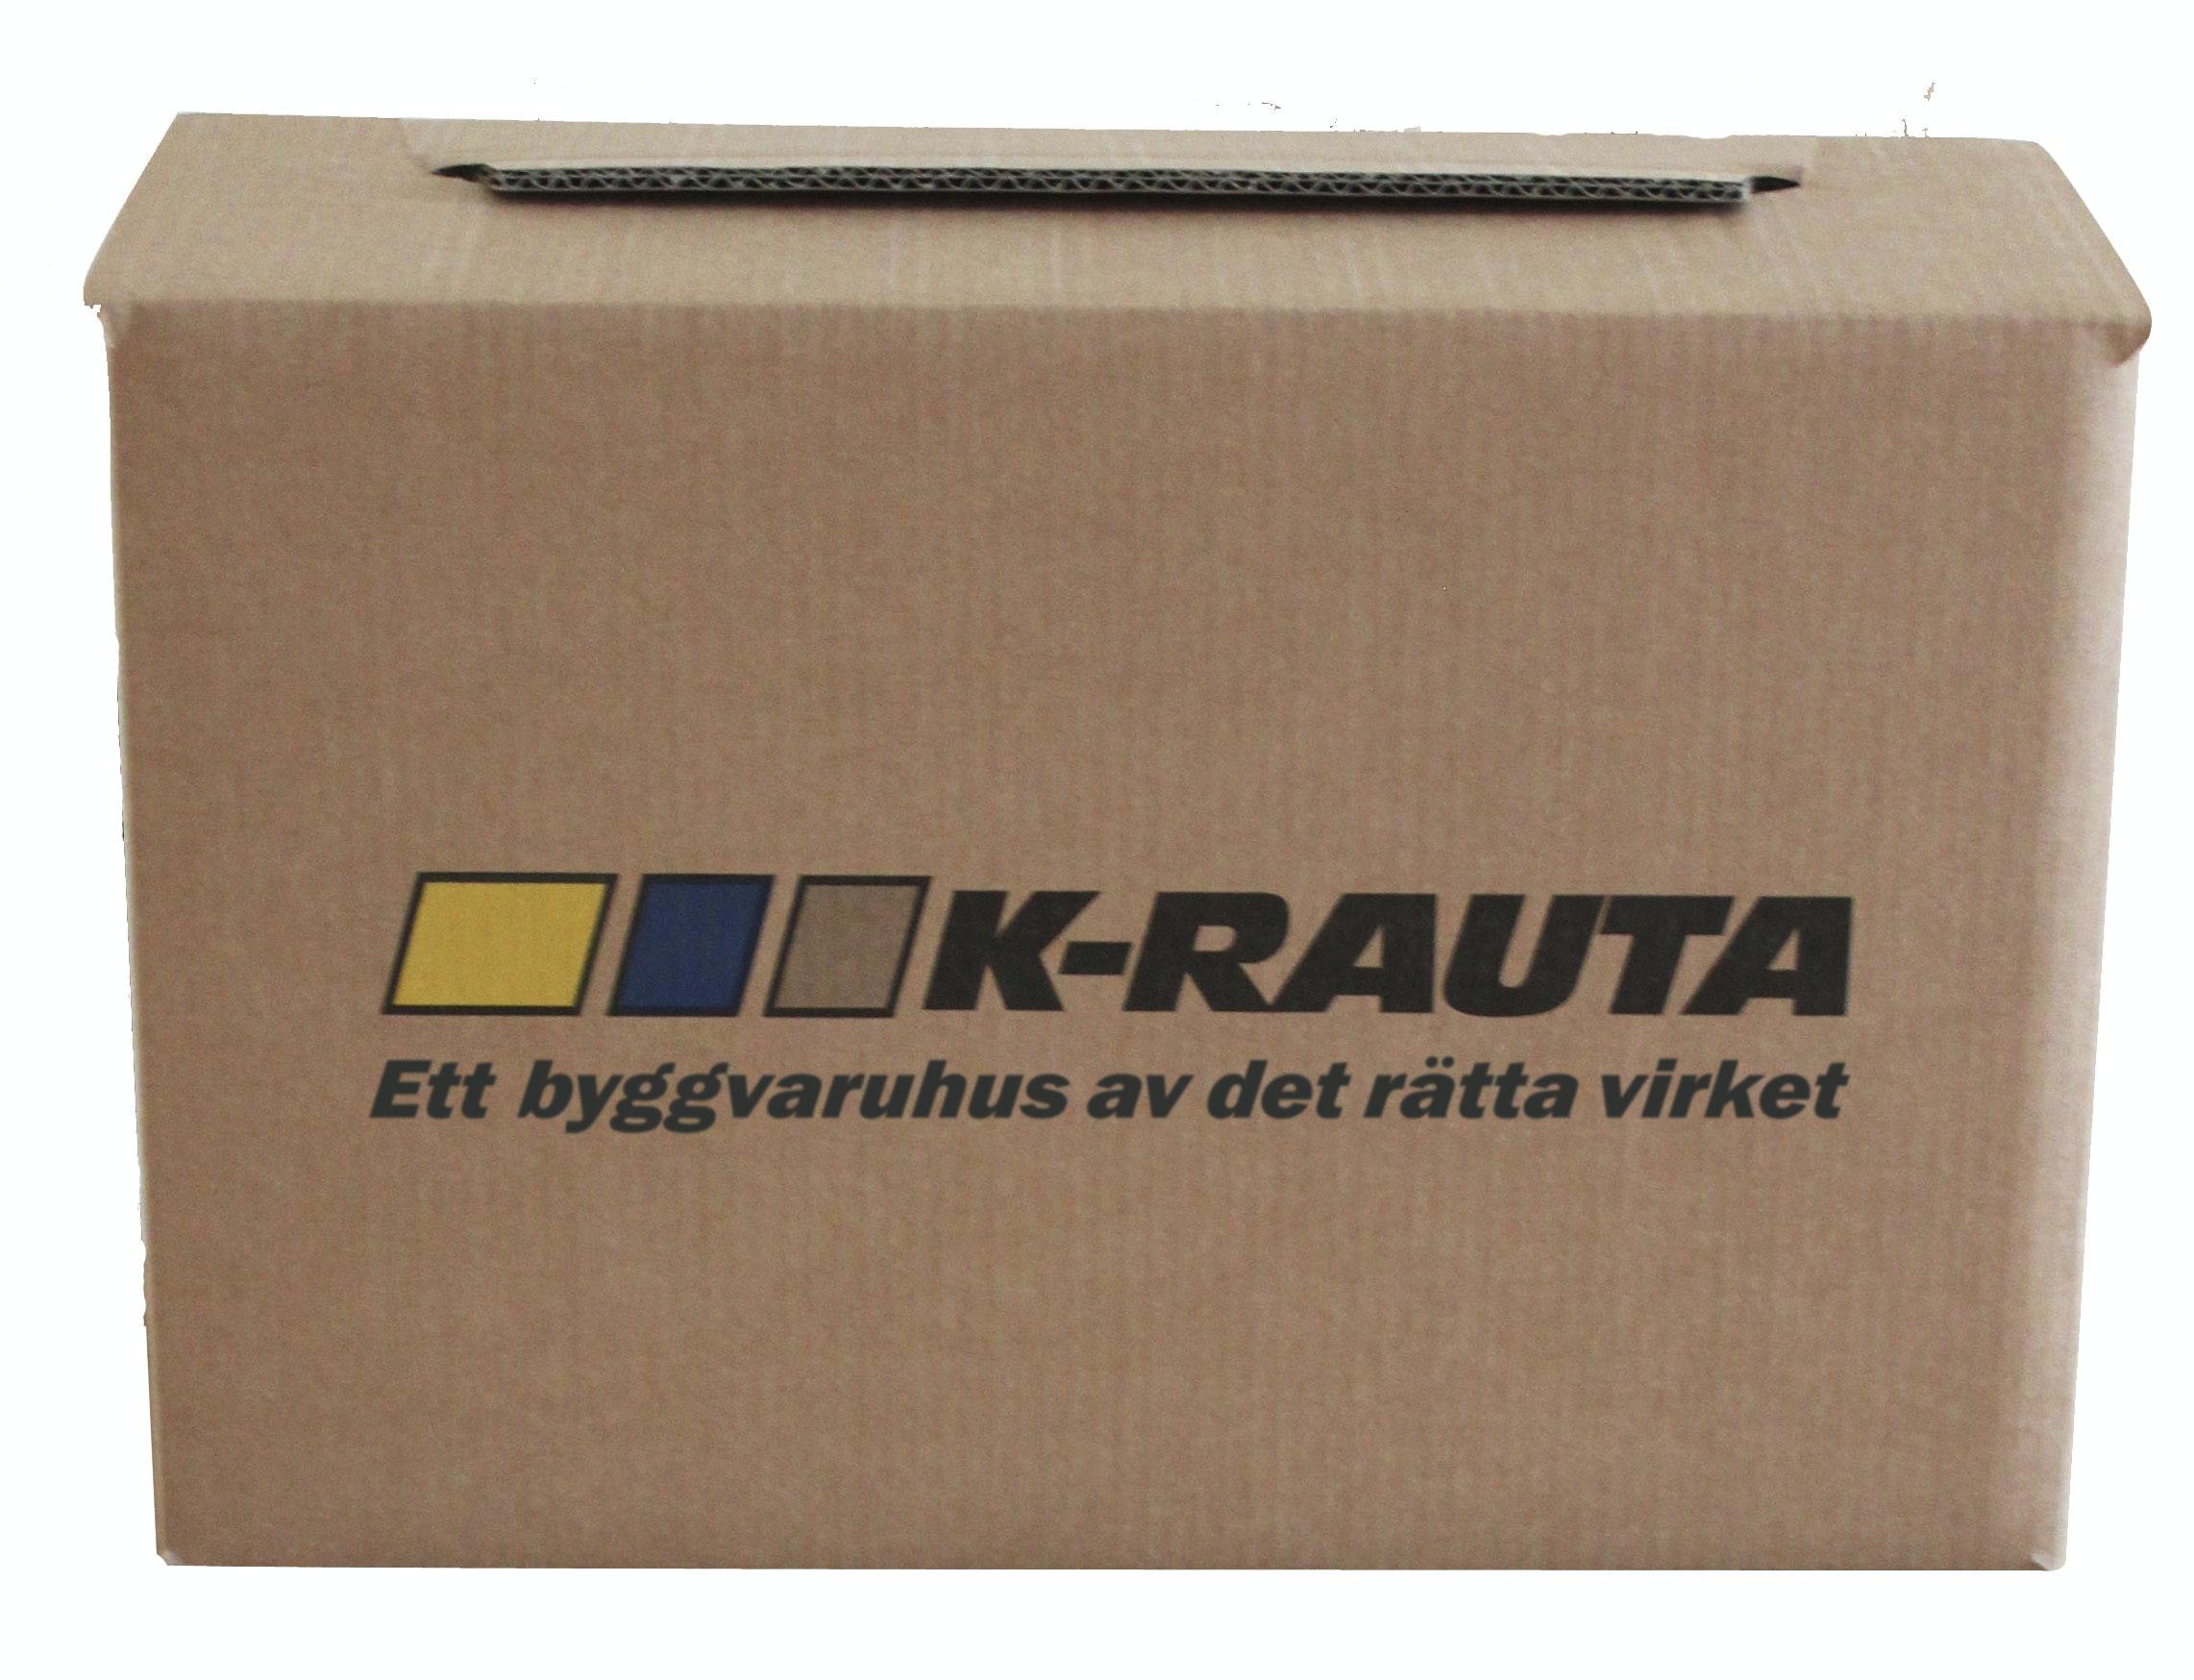 Flyttlåda K-rauta Stor 58x42x33